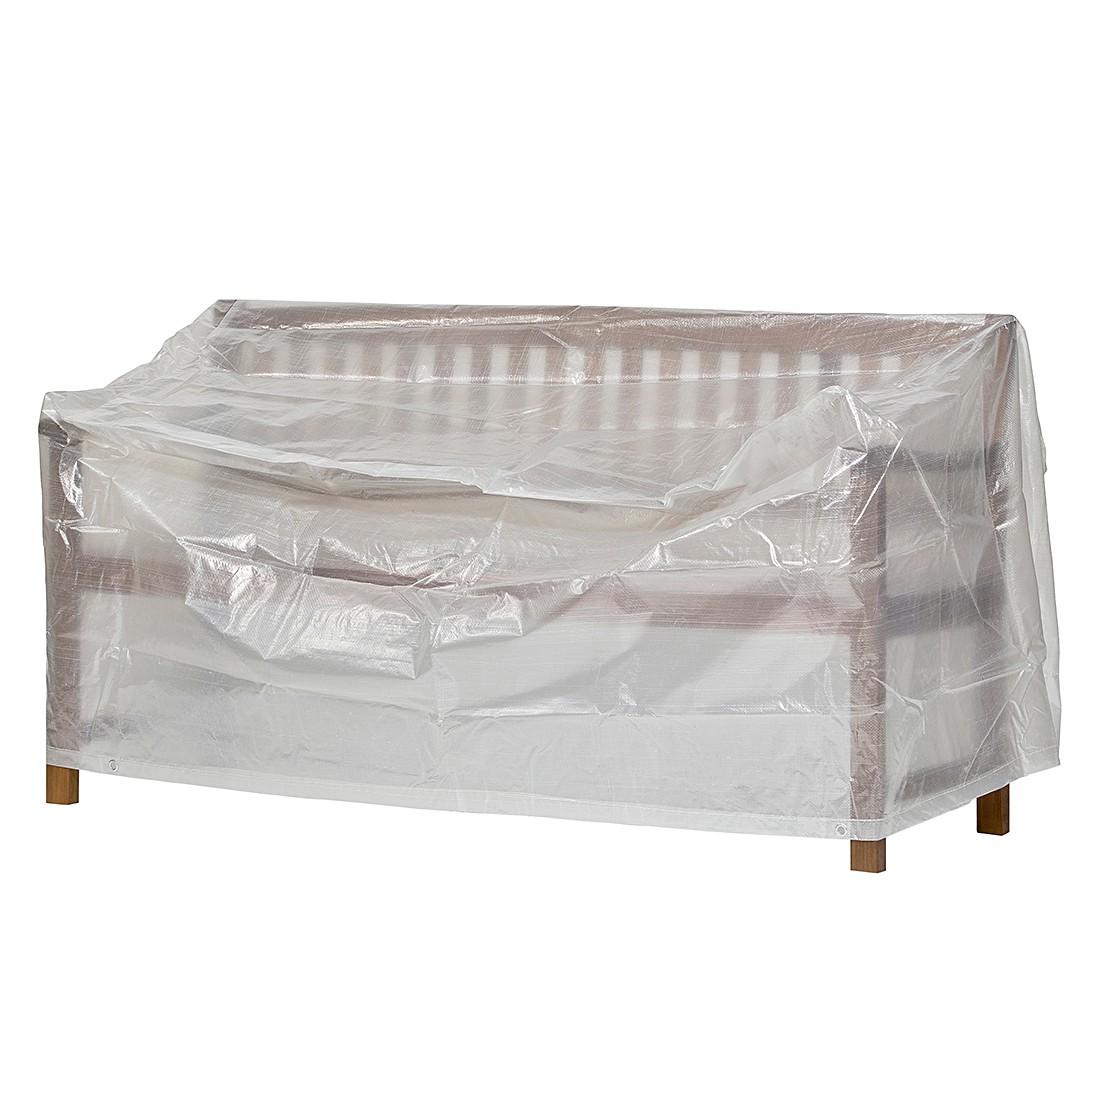 kunststoff gartenbank stapelbar 220145 eine. Black Bedroom Furniture Sets. Home Design Ideas